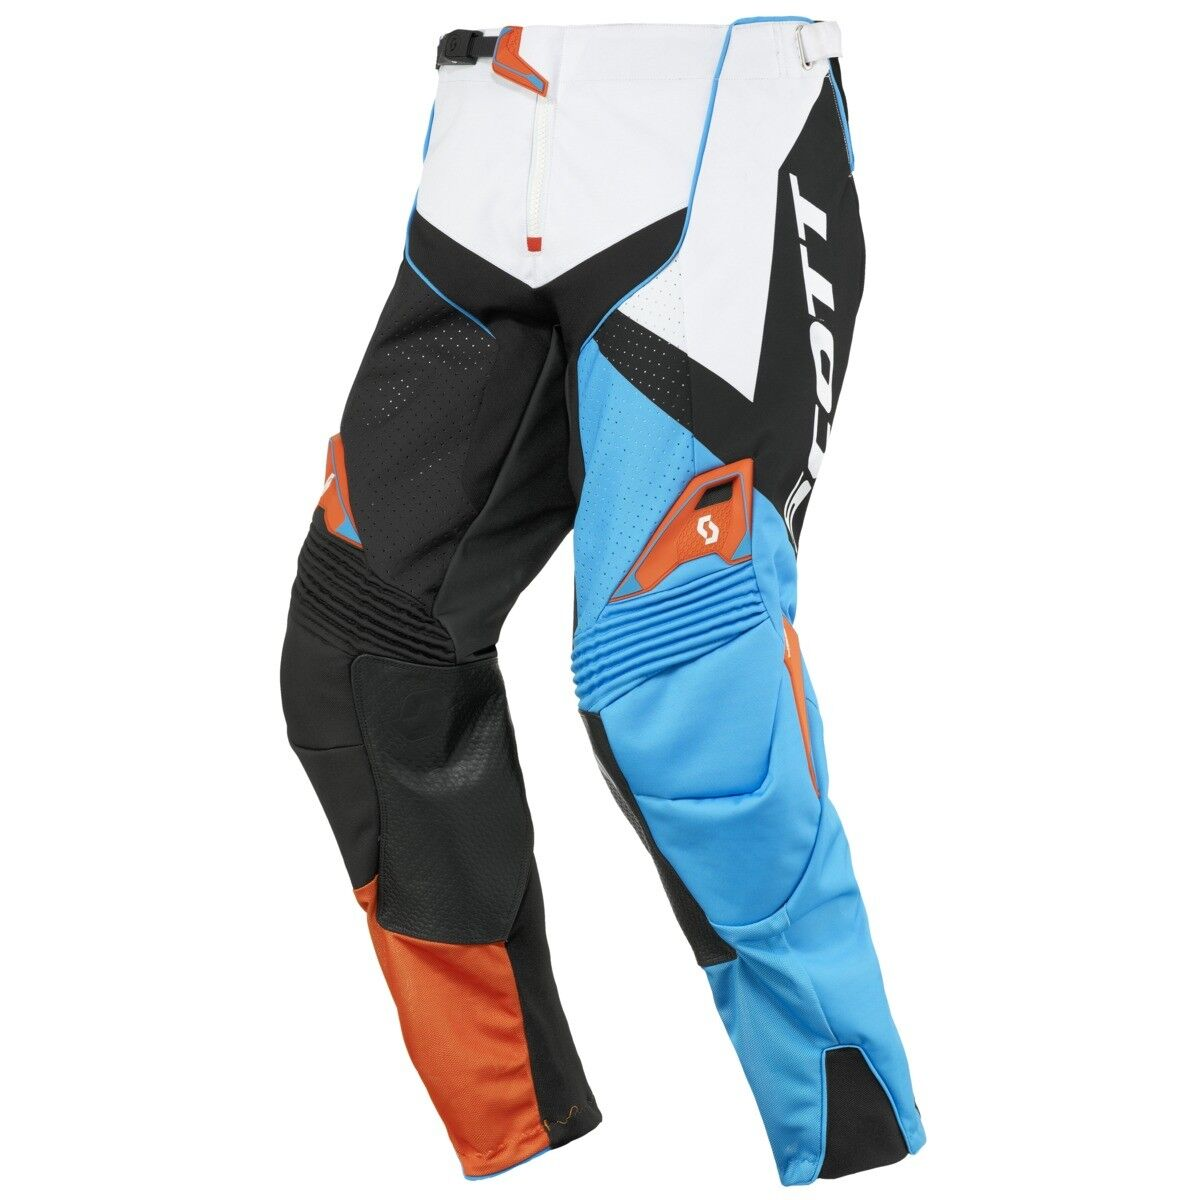 Scott 450 Podium MX Motocross / DH Fahrrad Hose blau/schwarz/weiß 2016